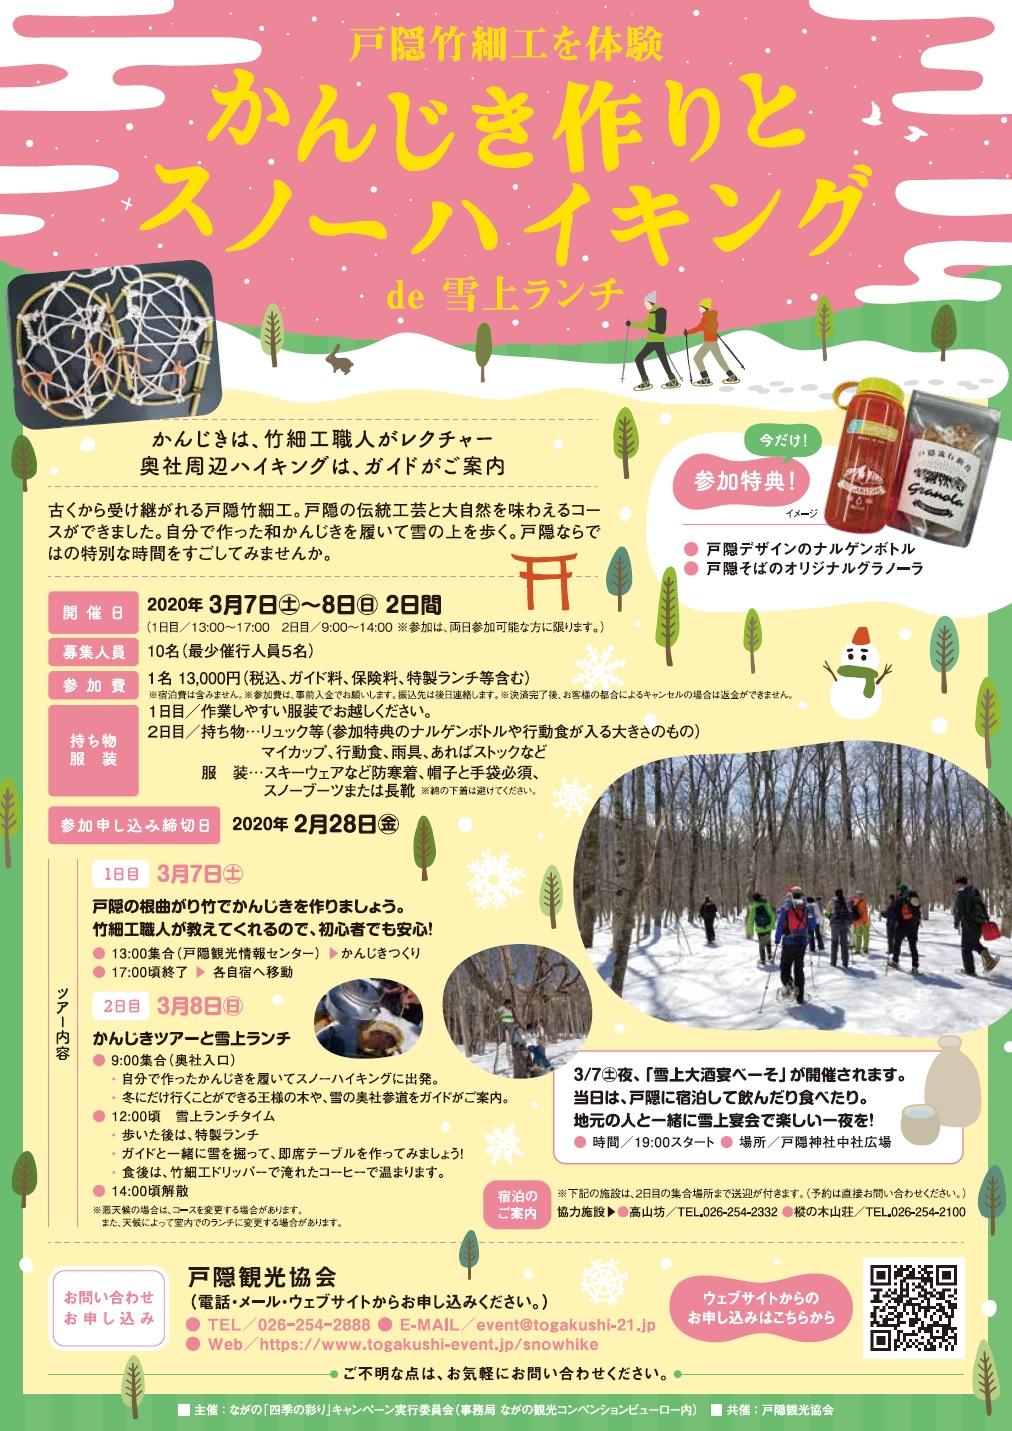 http://nagano-irodori.com/news/kiji_img/kanjiki.JPG